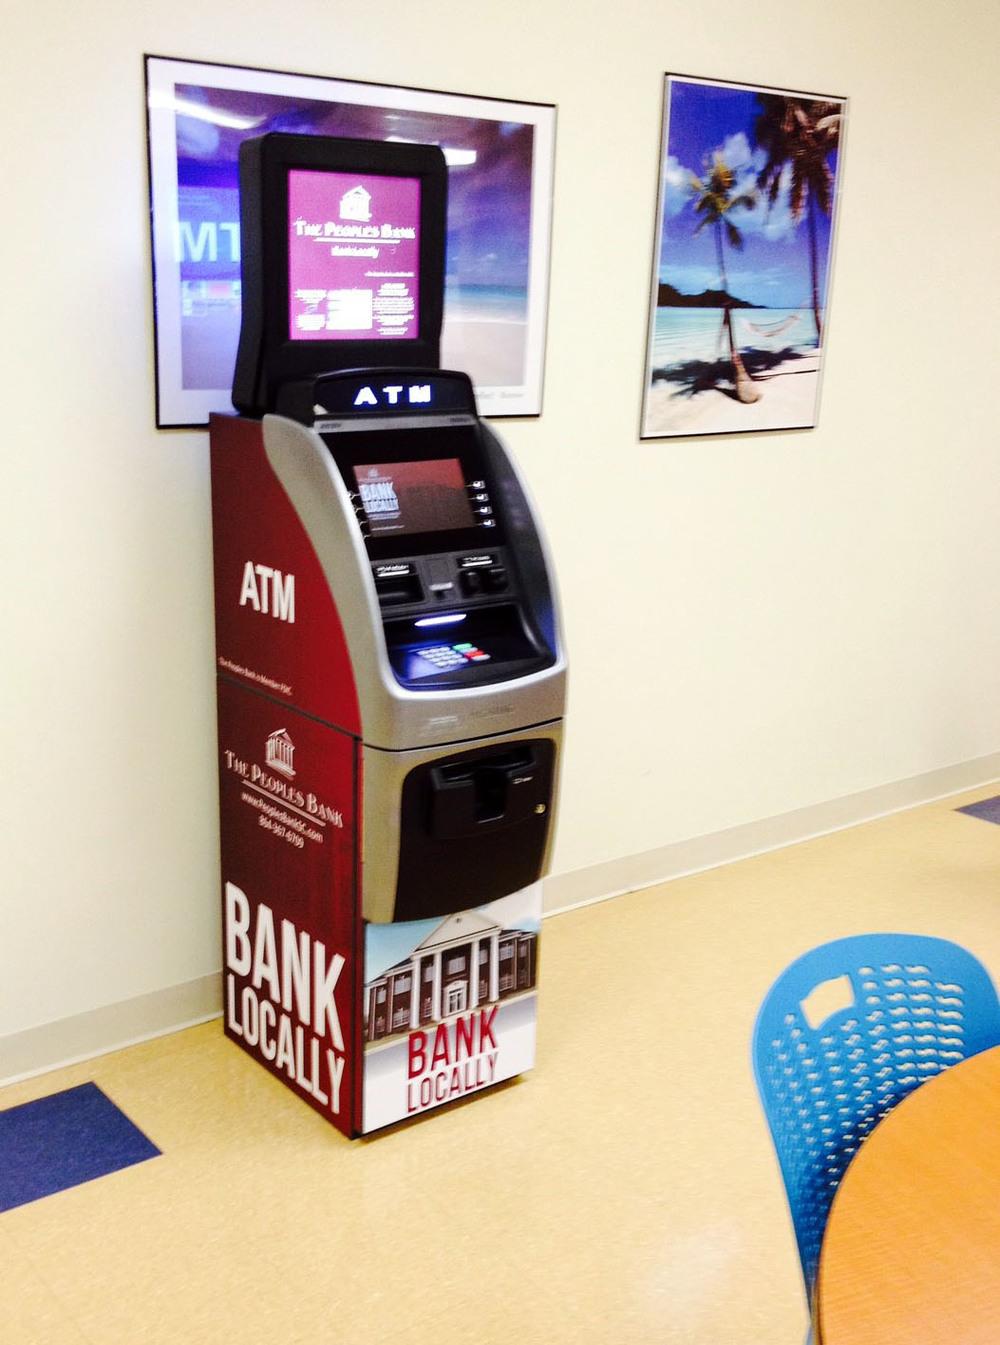 Bank Locally ATM in Break Room